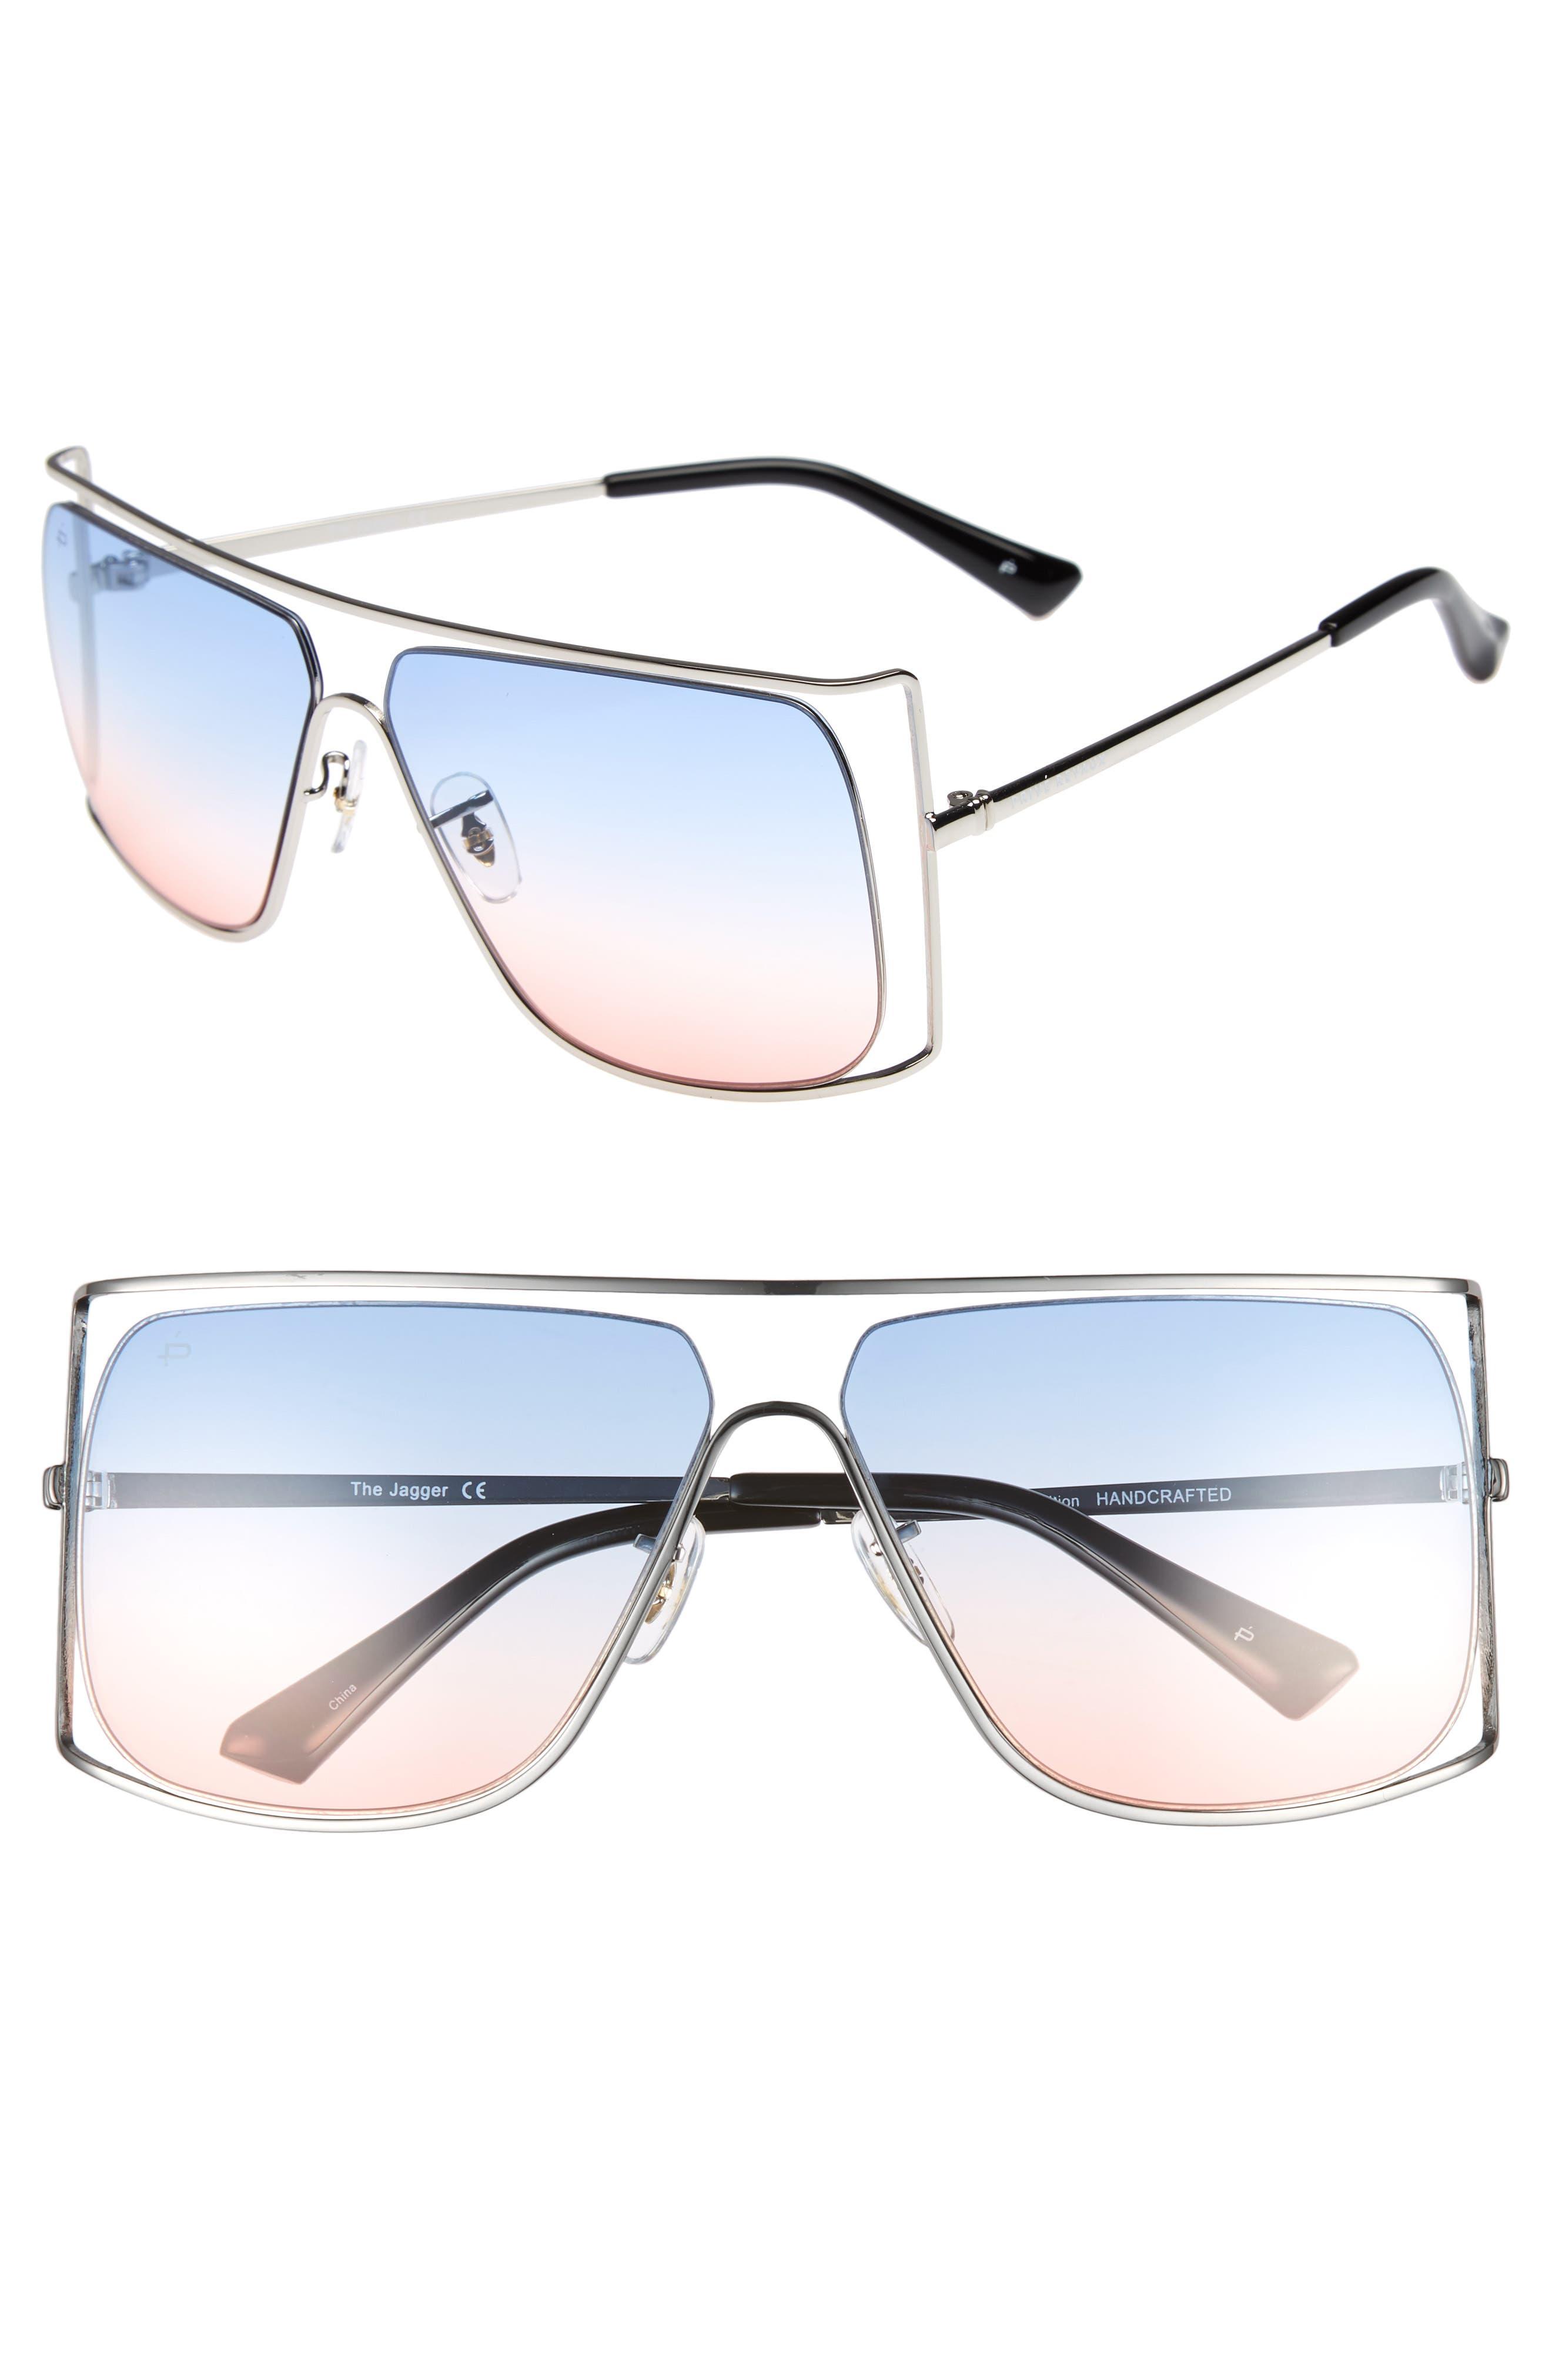 Privé Revaux The Jagger 60mm Square Sunglasses,                             Main thumbnail 1, color,                             Silver